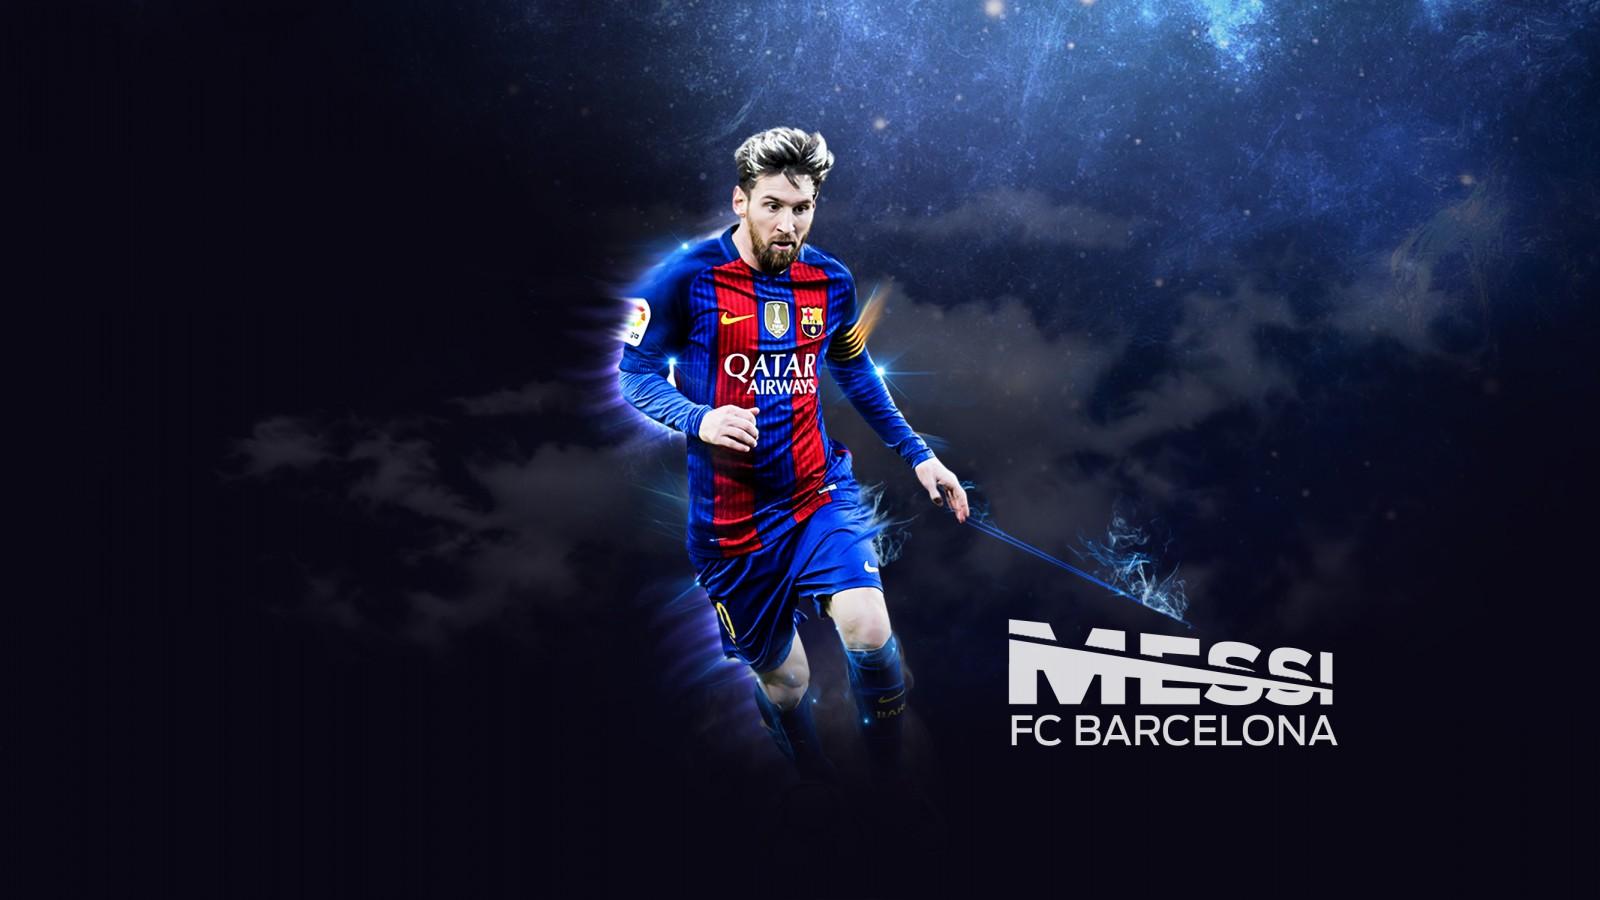 Barcelona 3d Wallpaper Lionel Messi Fc Barcelona Footballer Wallpapers Hd